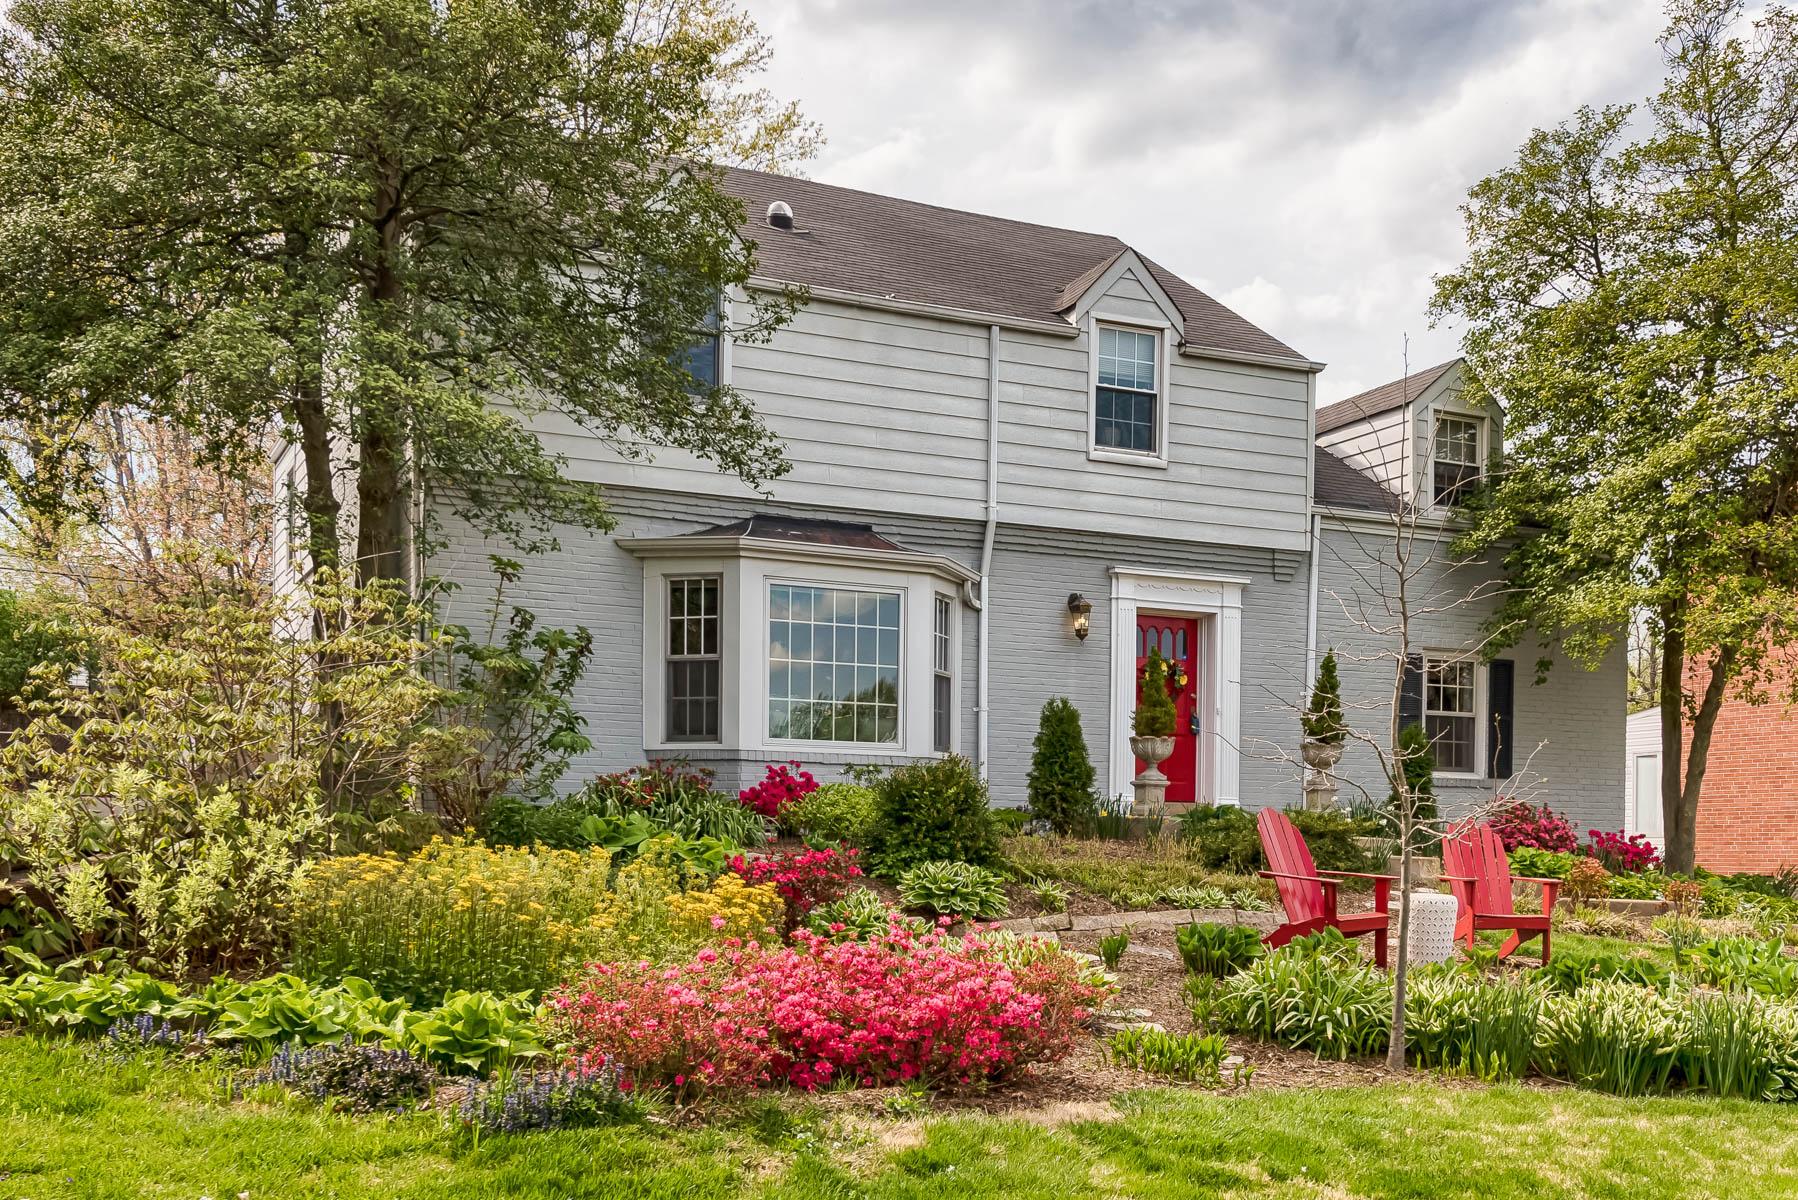 Single Family Home for Sale at Rye Lane 45 Rye Lane Olivette, Missouri 63132 United States